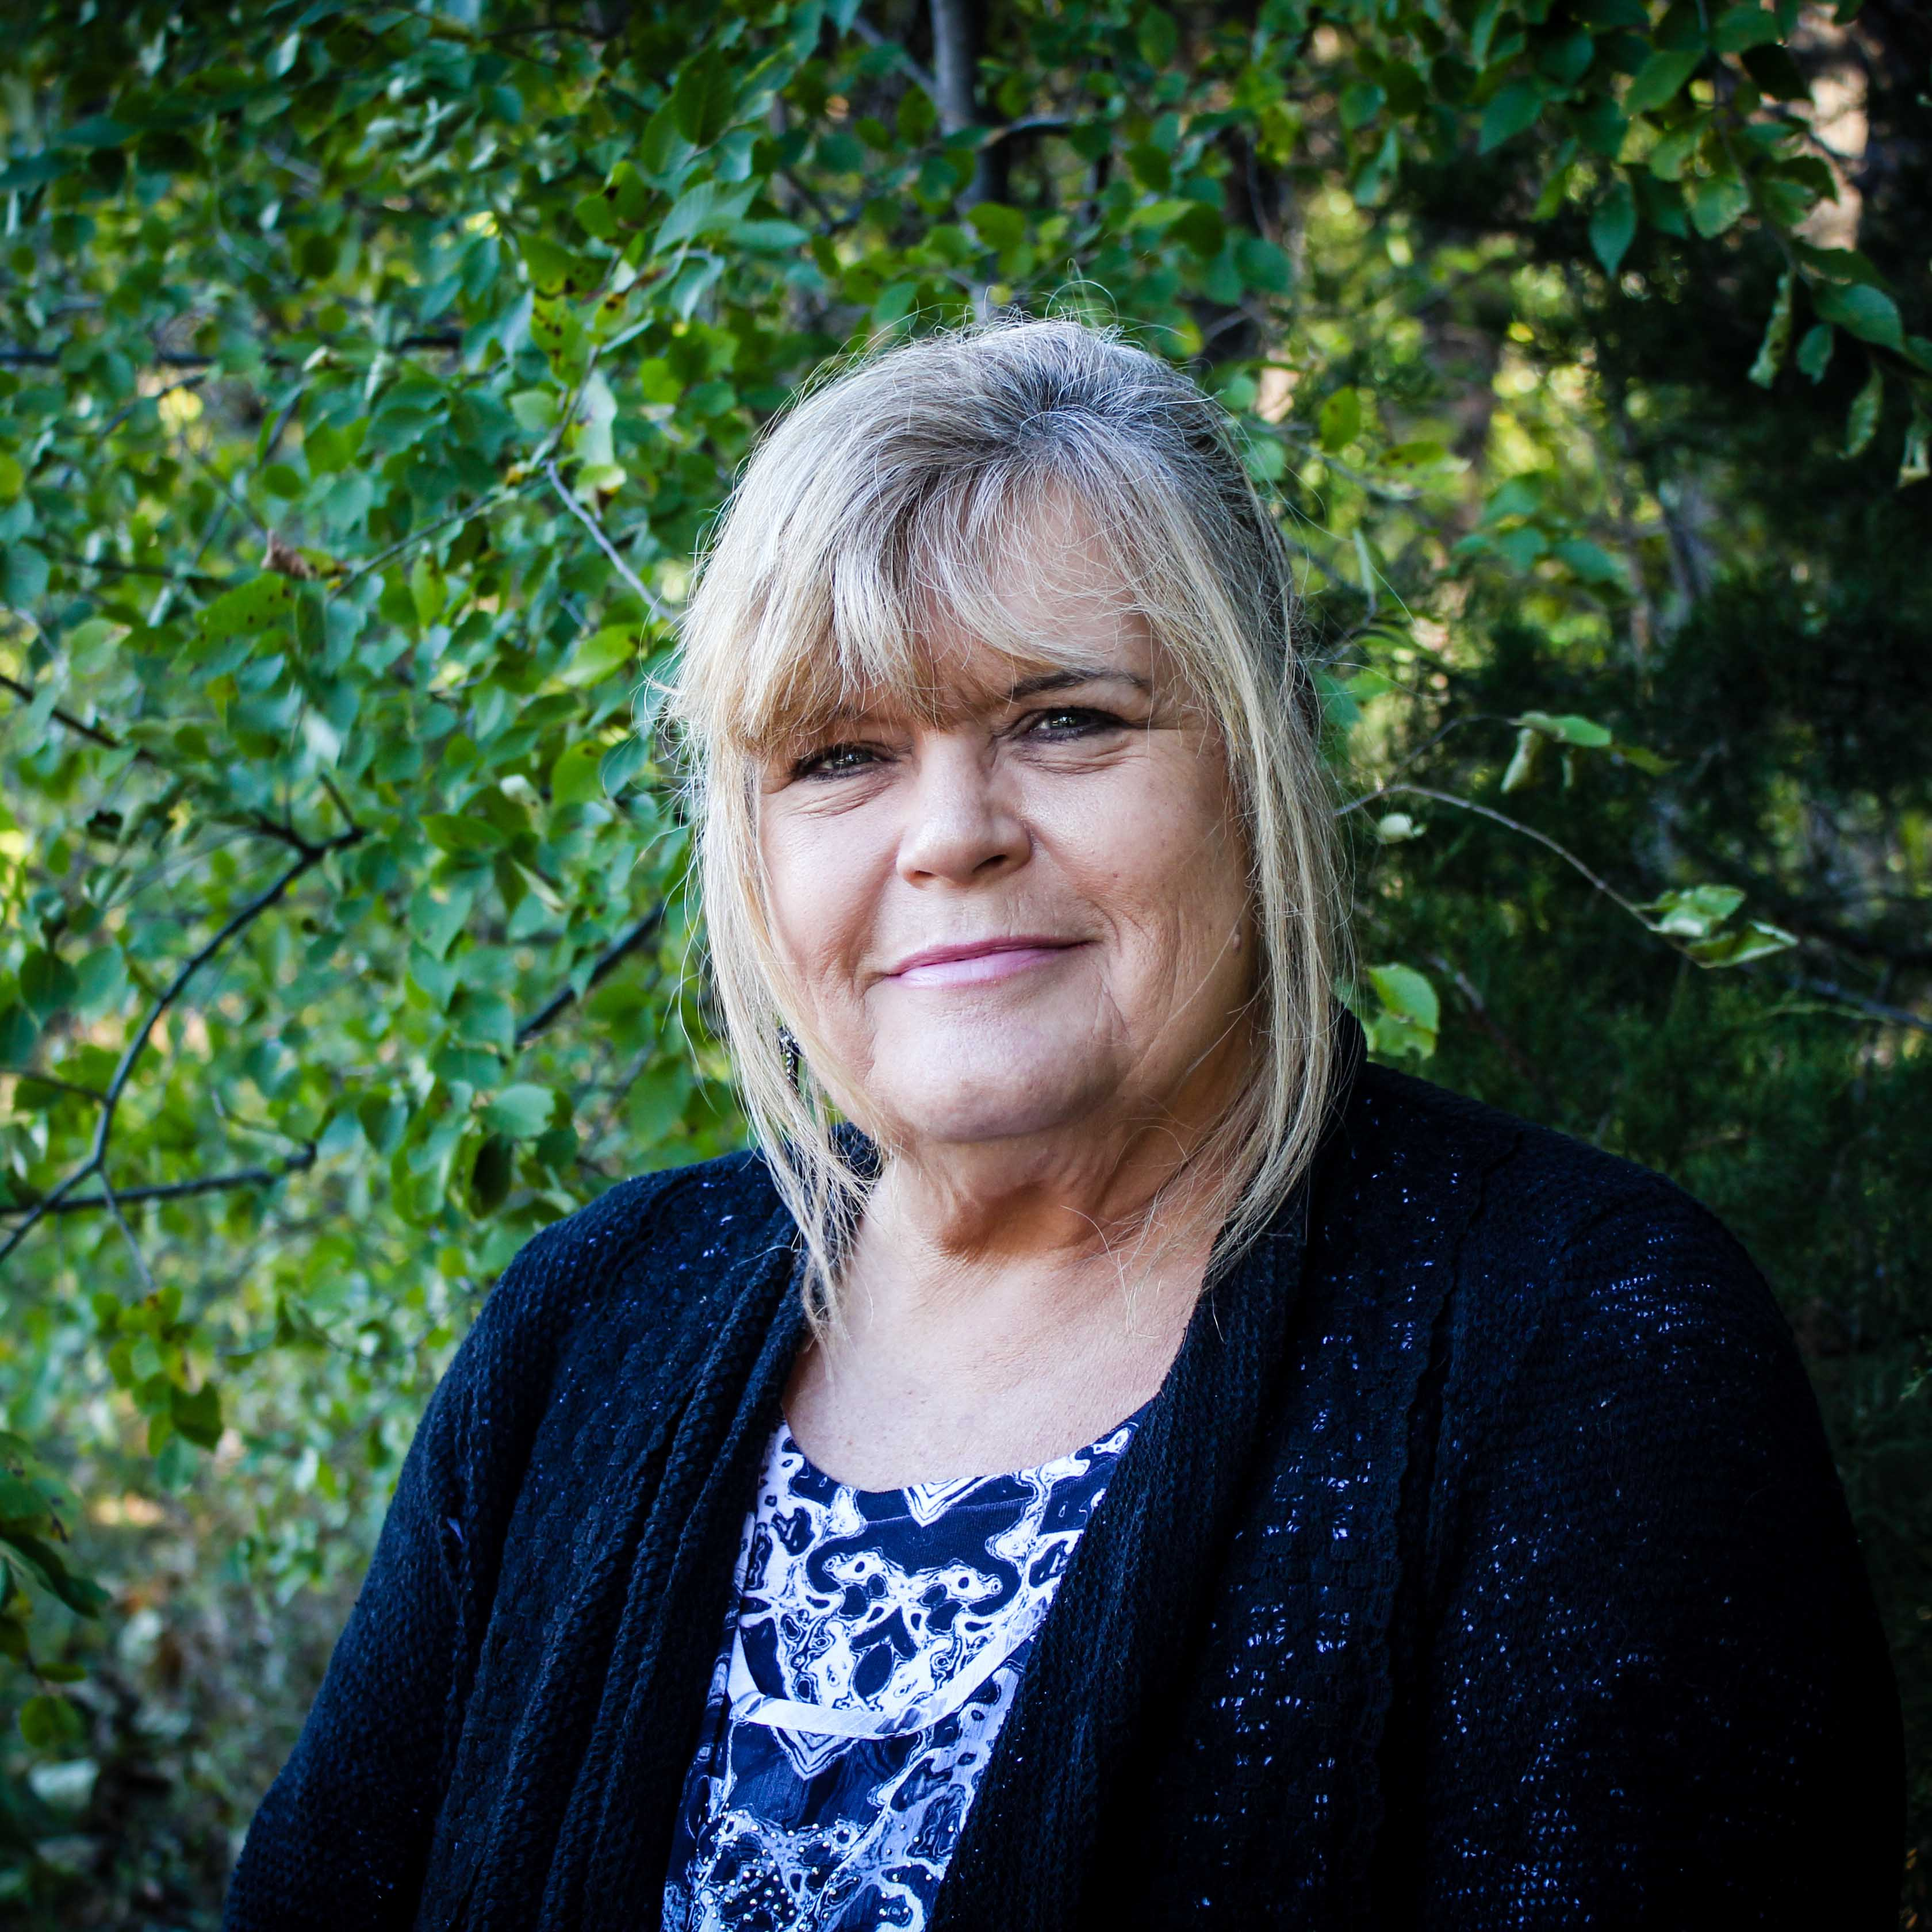 Sue Lockwood